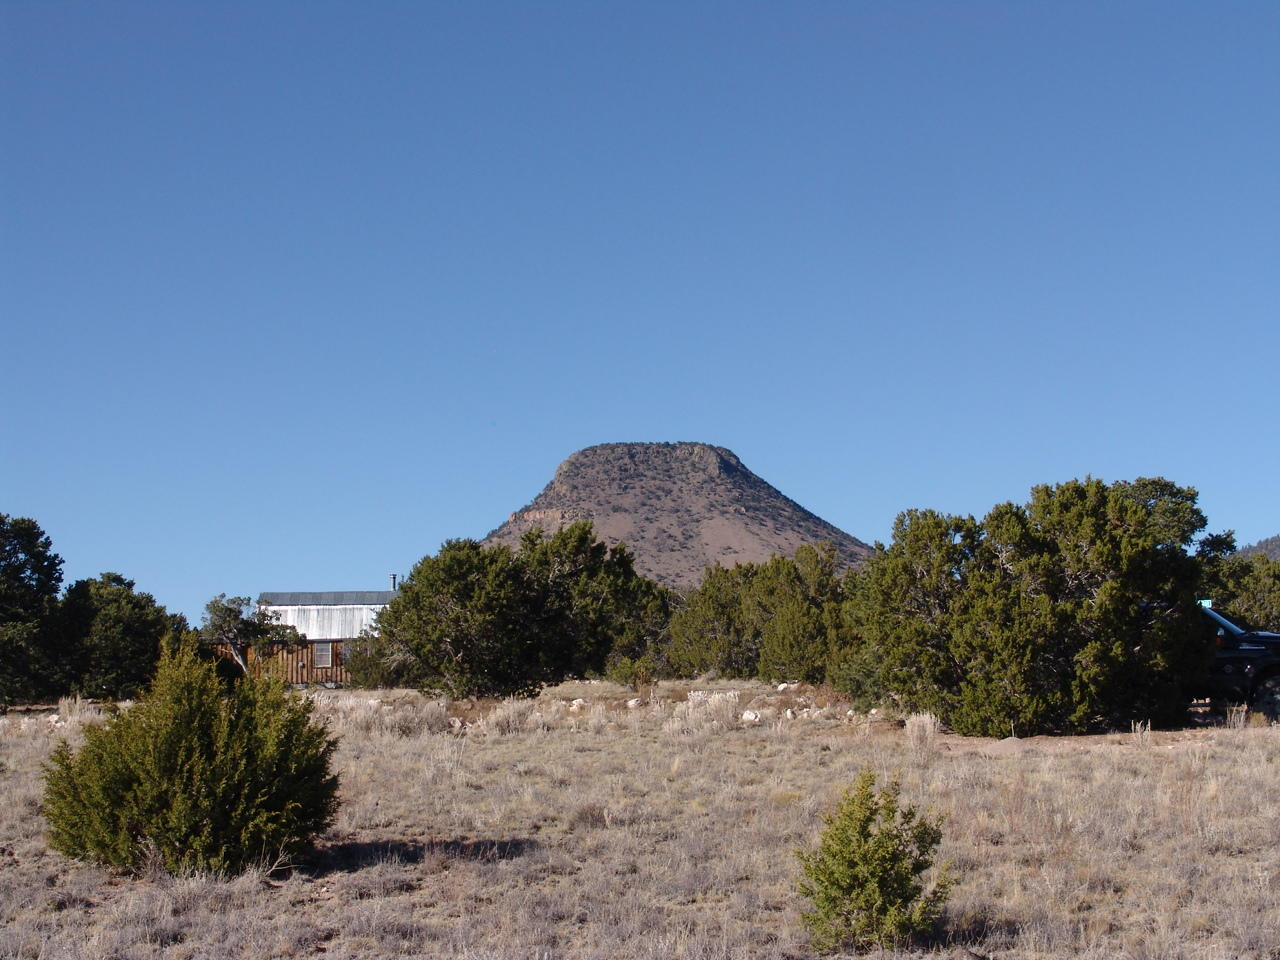 96 SUGARLOAF Trail Property Photo - Datil, NM real estate listing